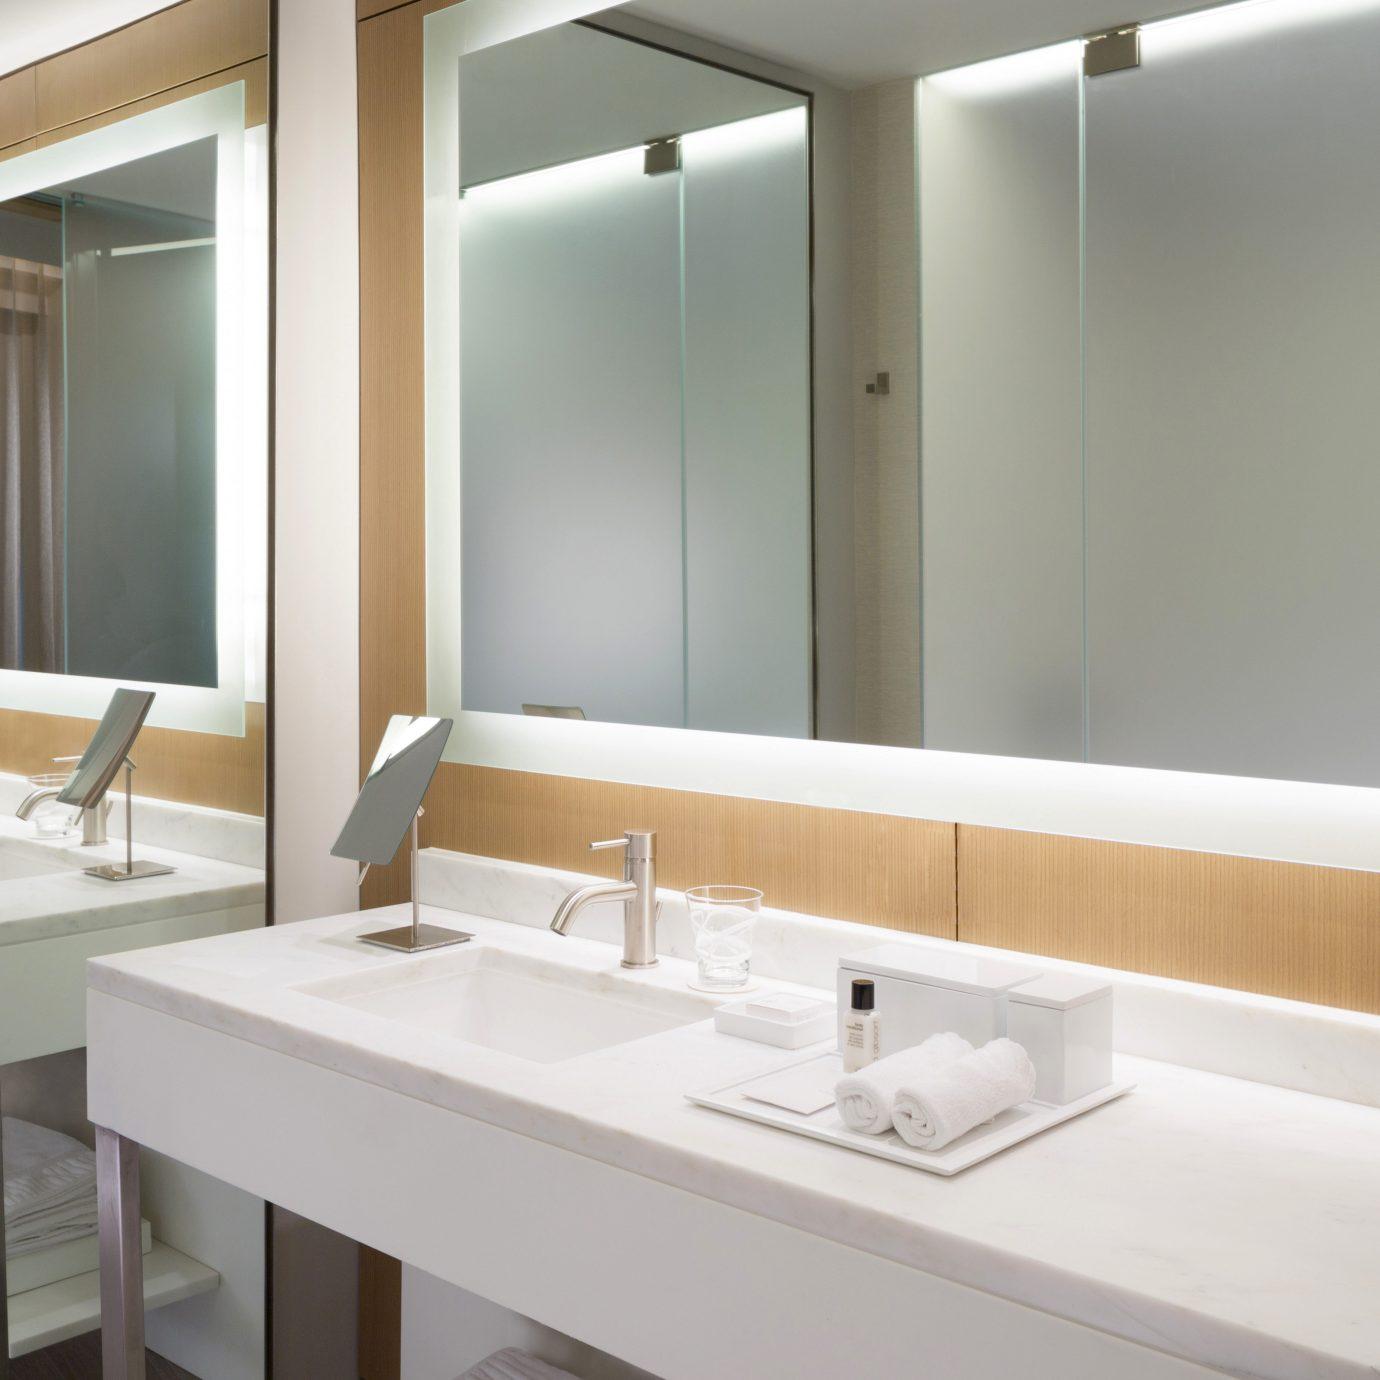 bathroom mirror sink property Suite condominium Modern